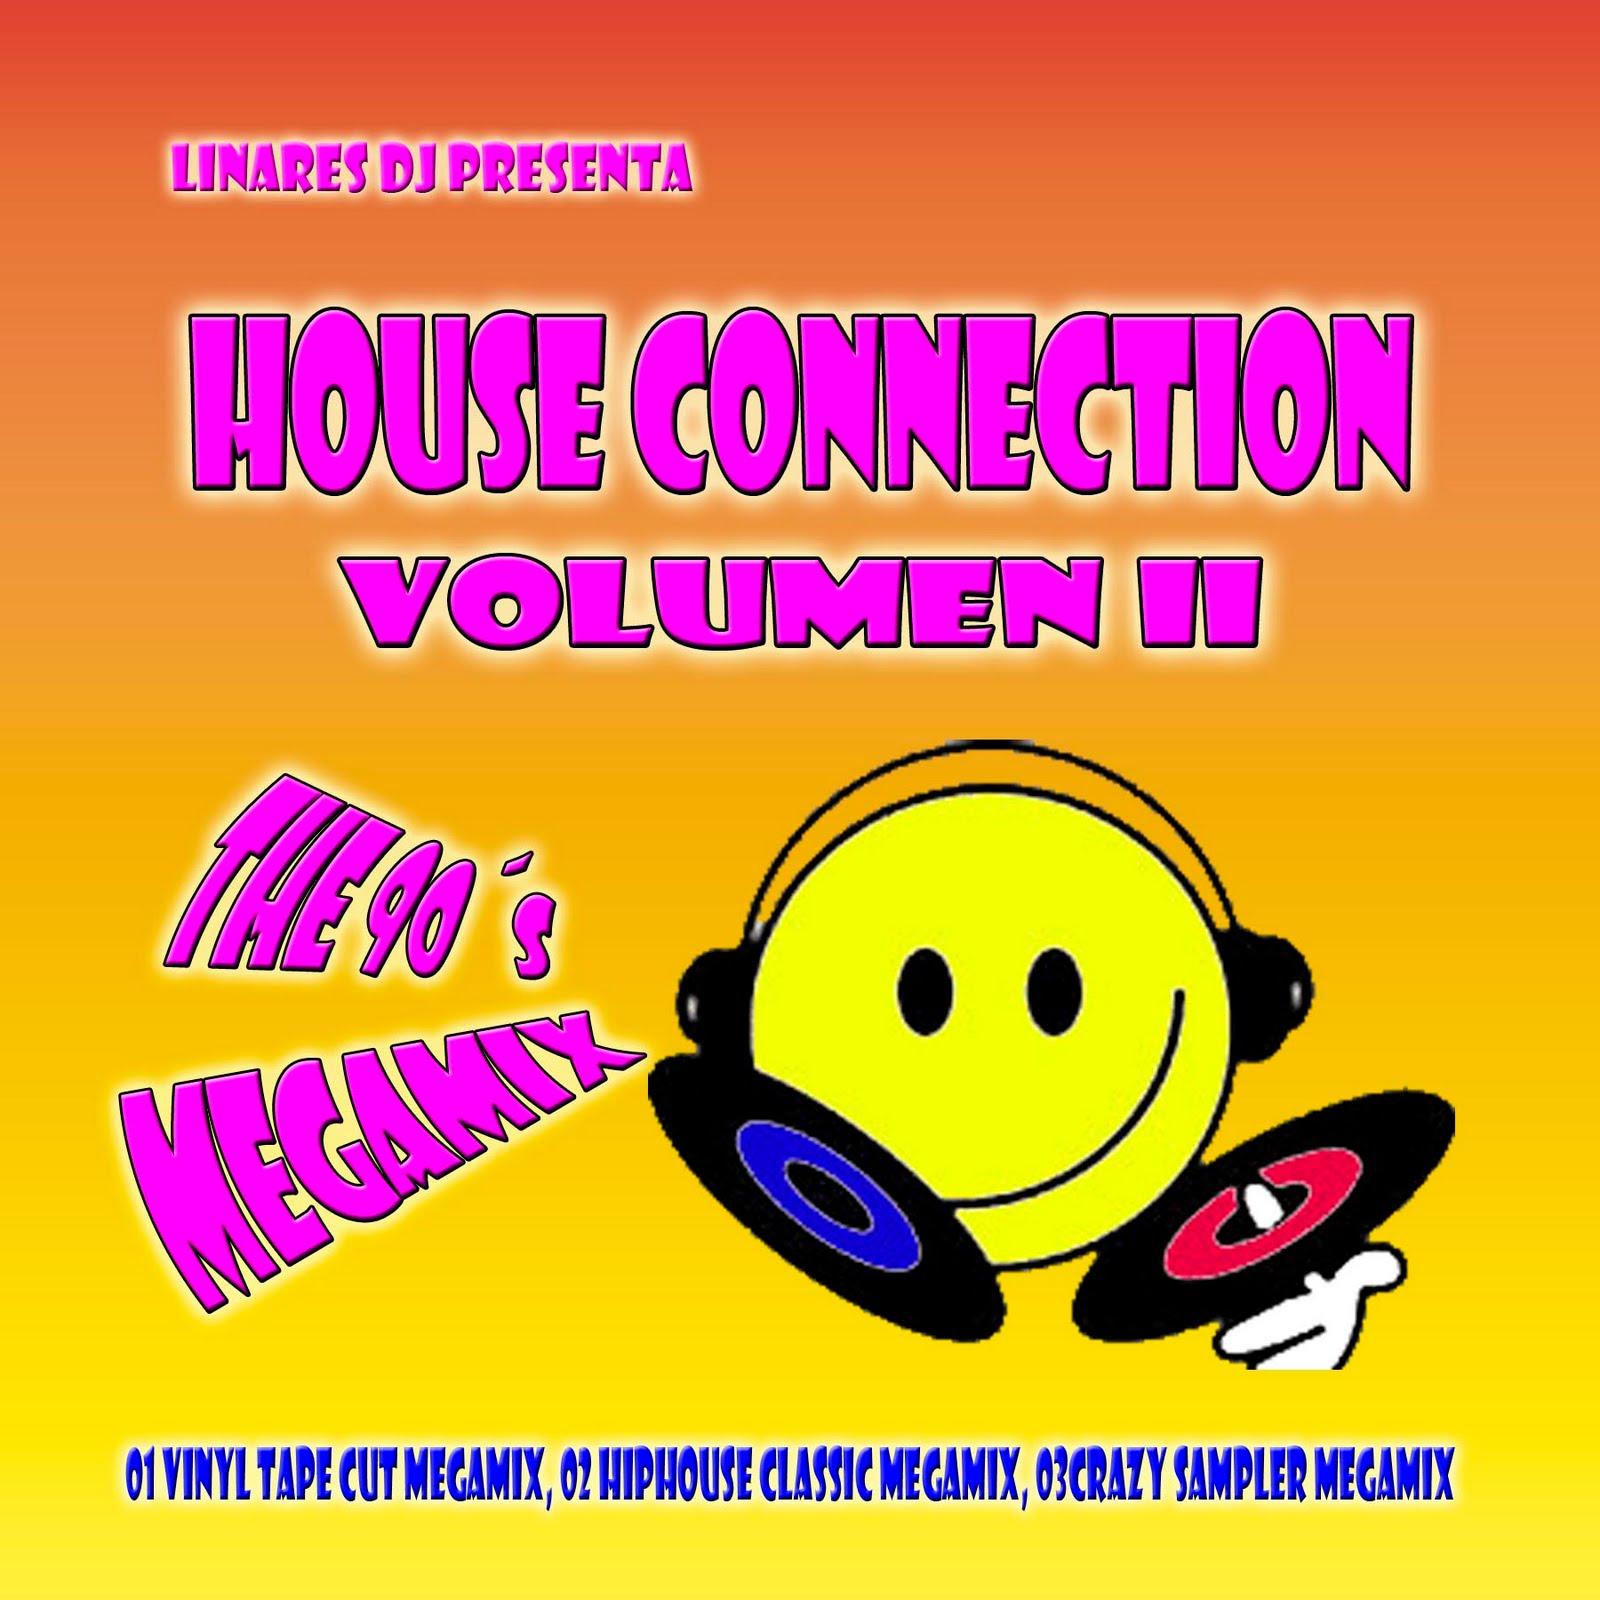 Linares Disco Mix 80s Linares Dj House Connection 2